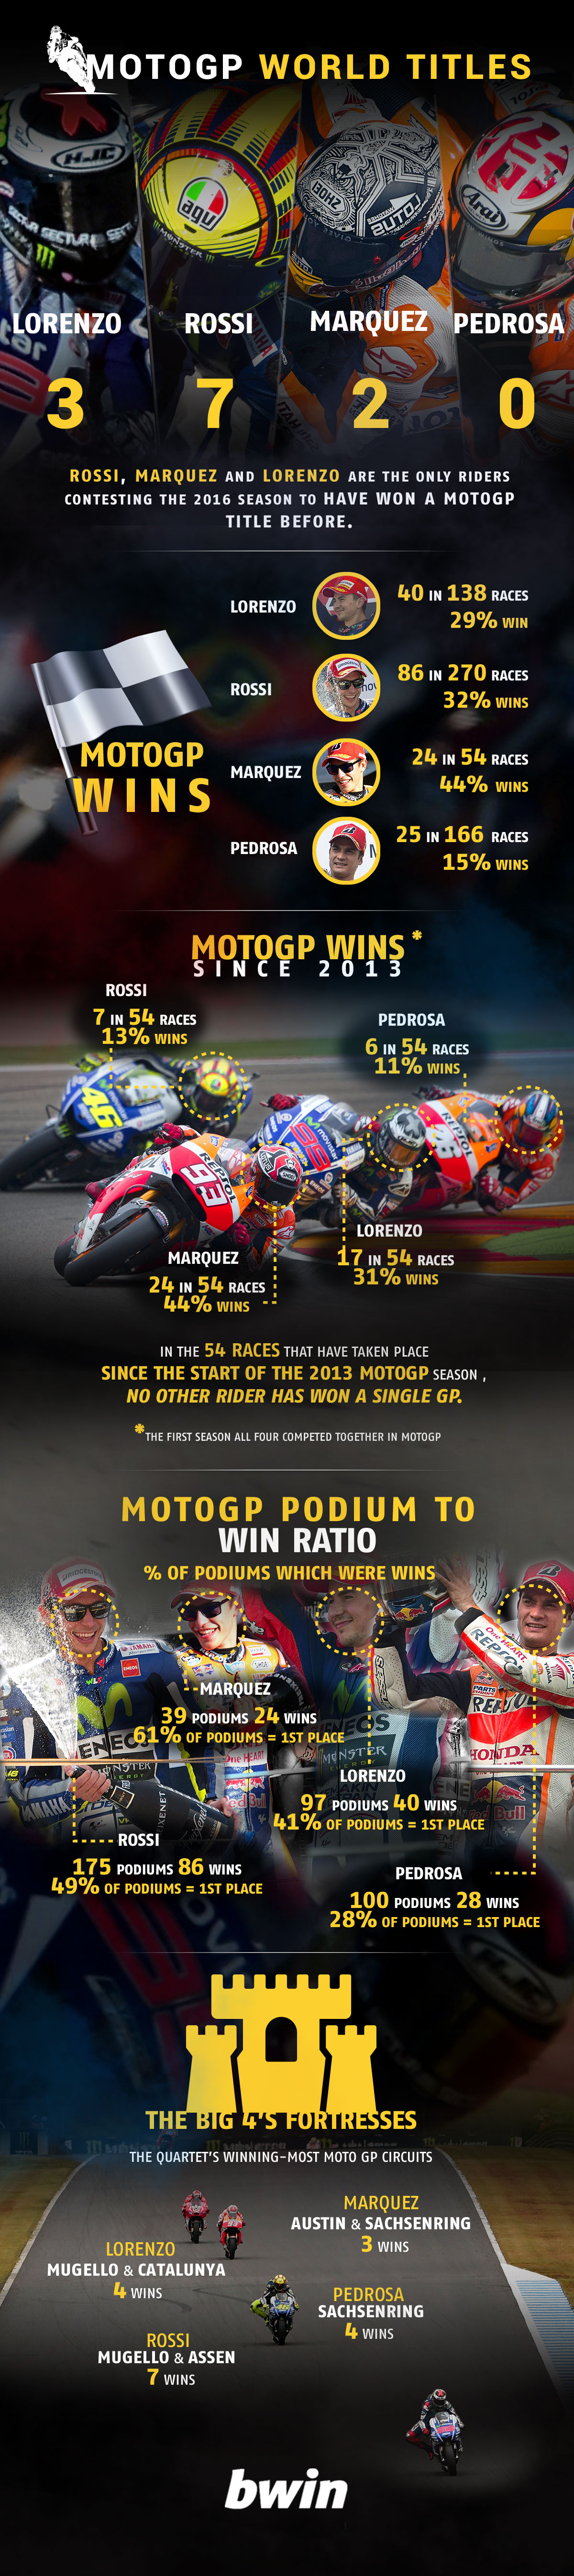 Moto GP odds